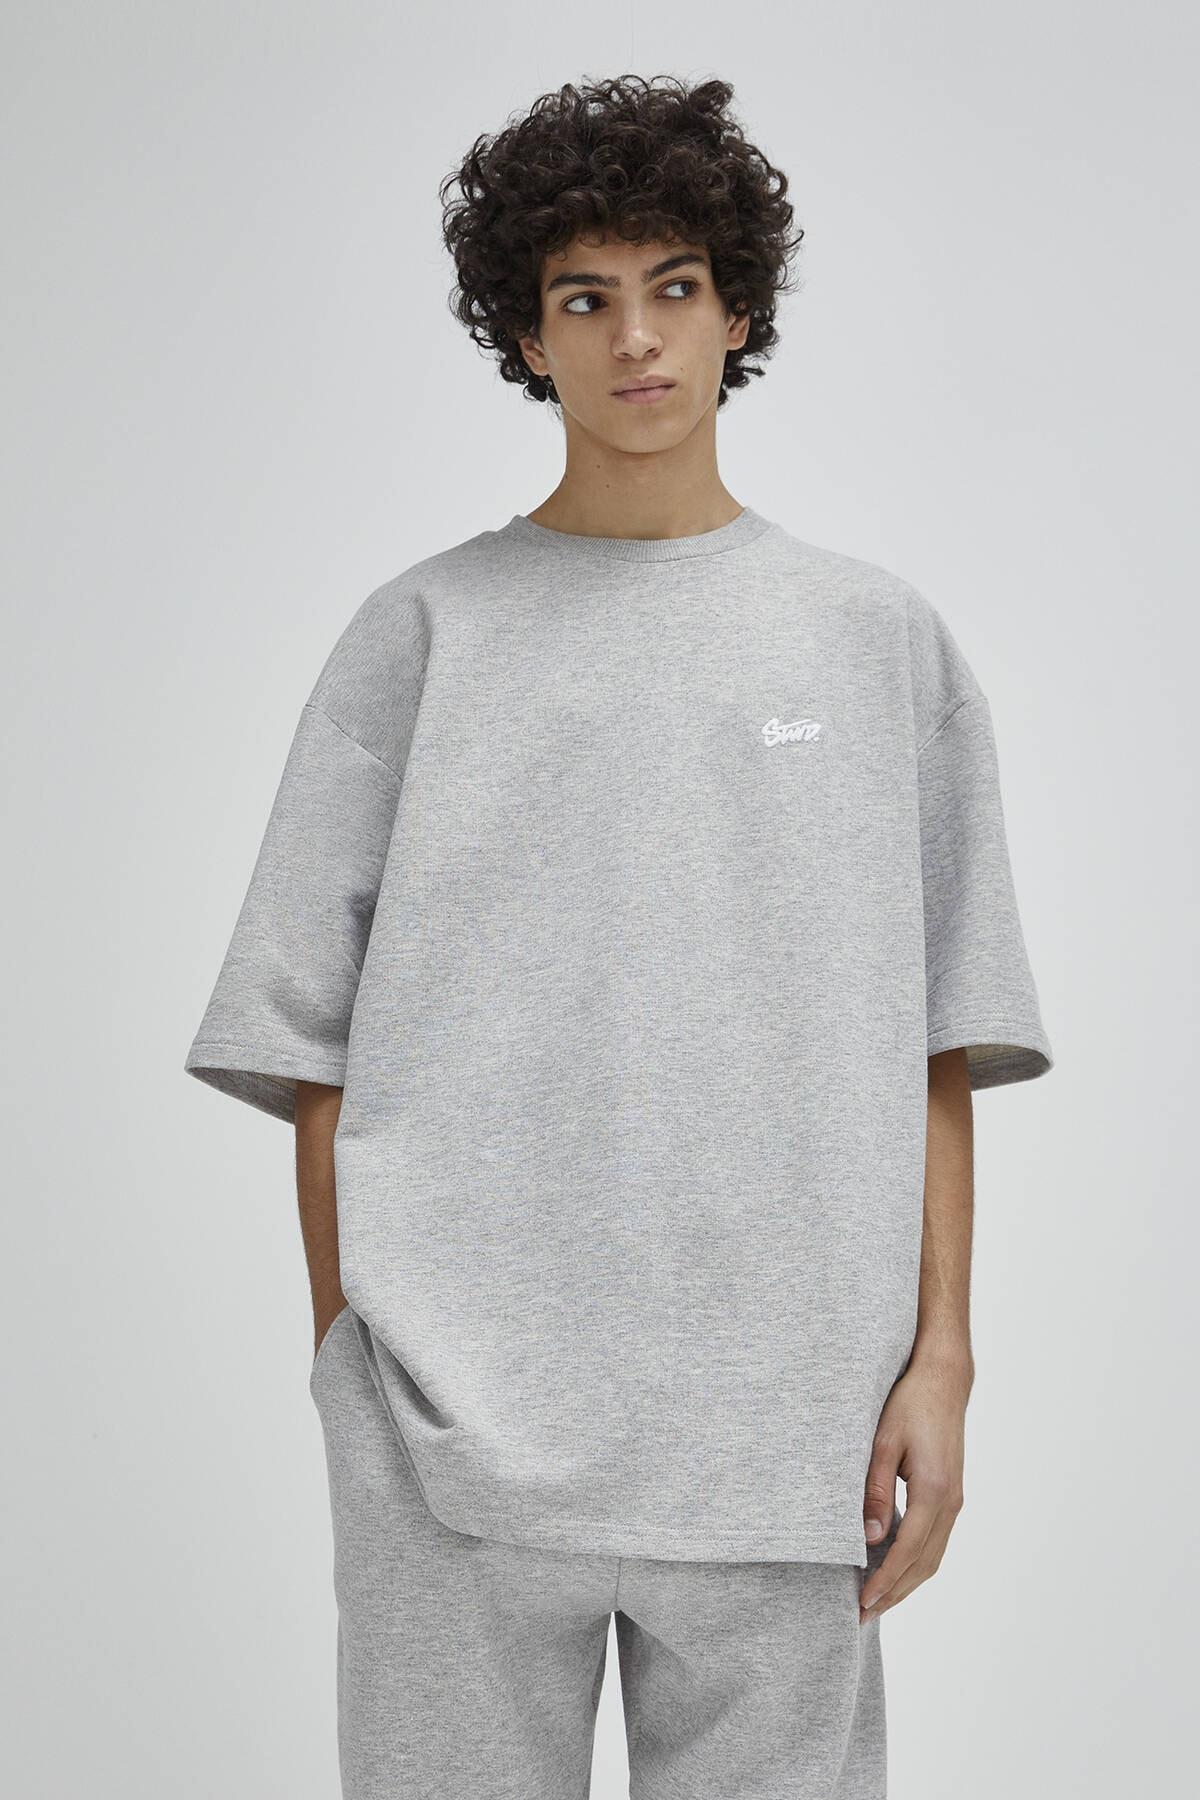 Pull & Bear Erkek Açık Gri Homewear Kapsül Koleksiyonu T-Shirt 04240542 0